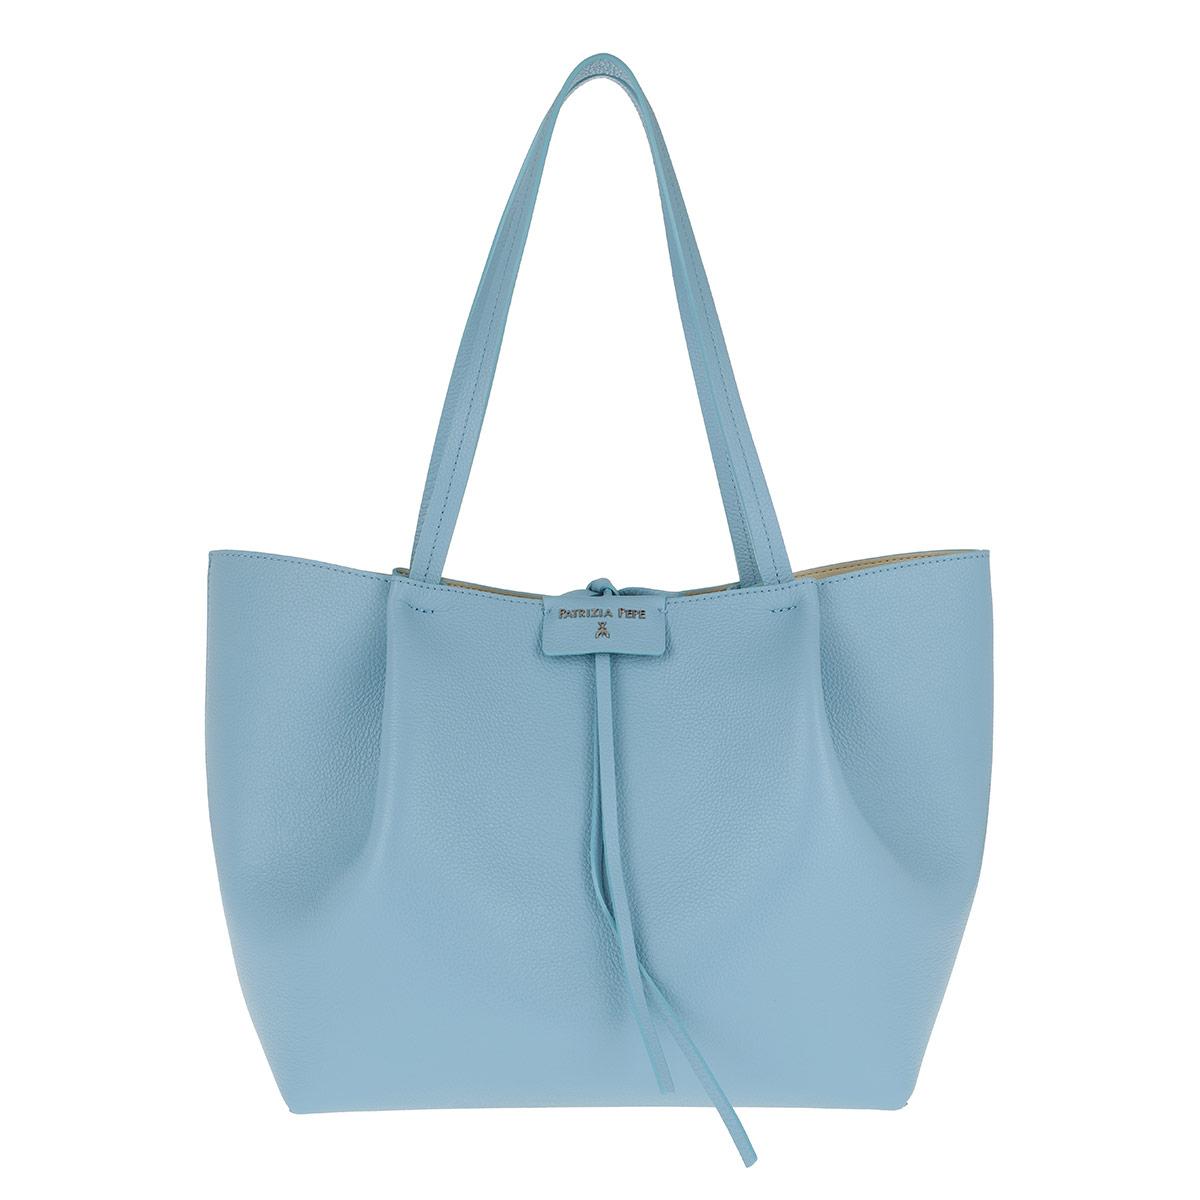 Patrizia Pepe Shopper - Logo Shopping Bag Cosmic Blue - in blau - für Damen